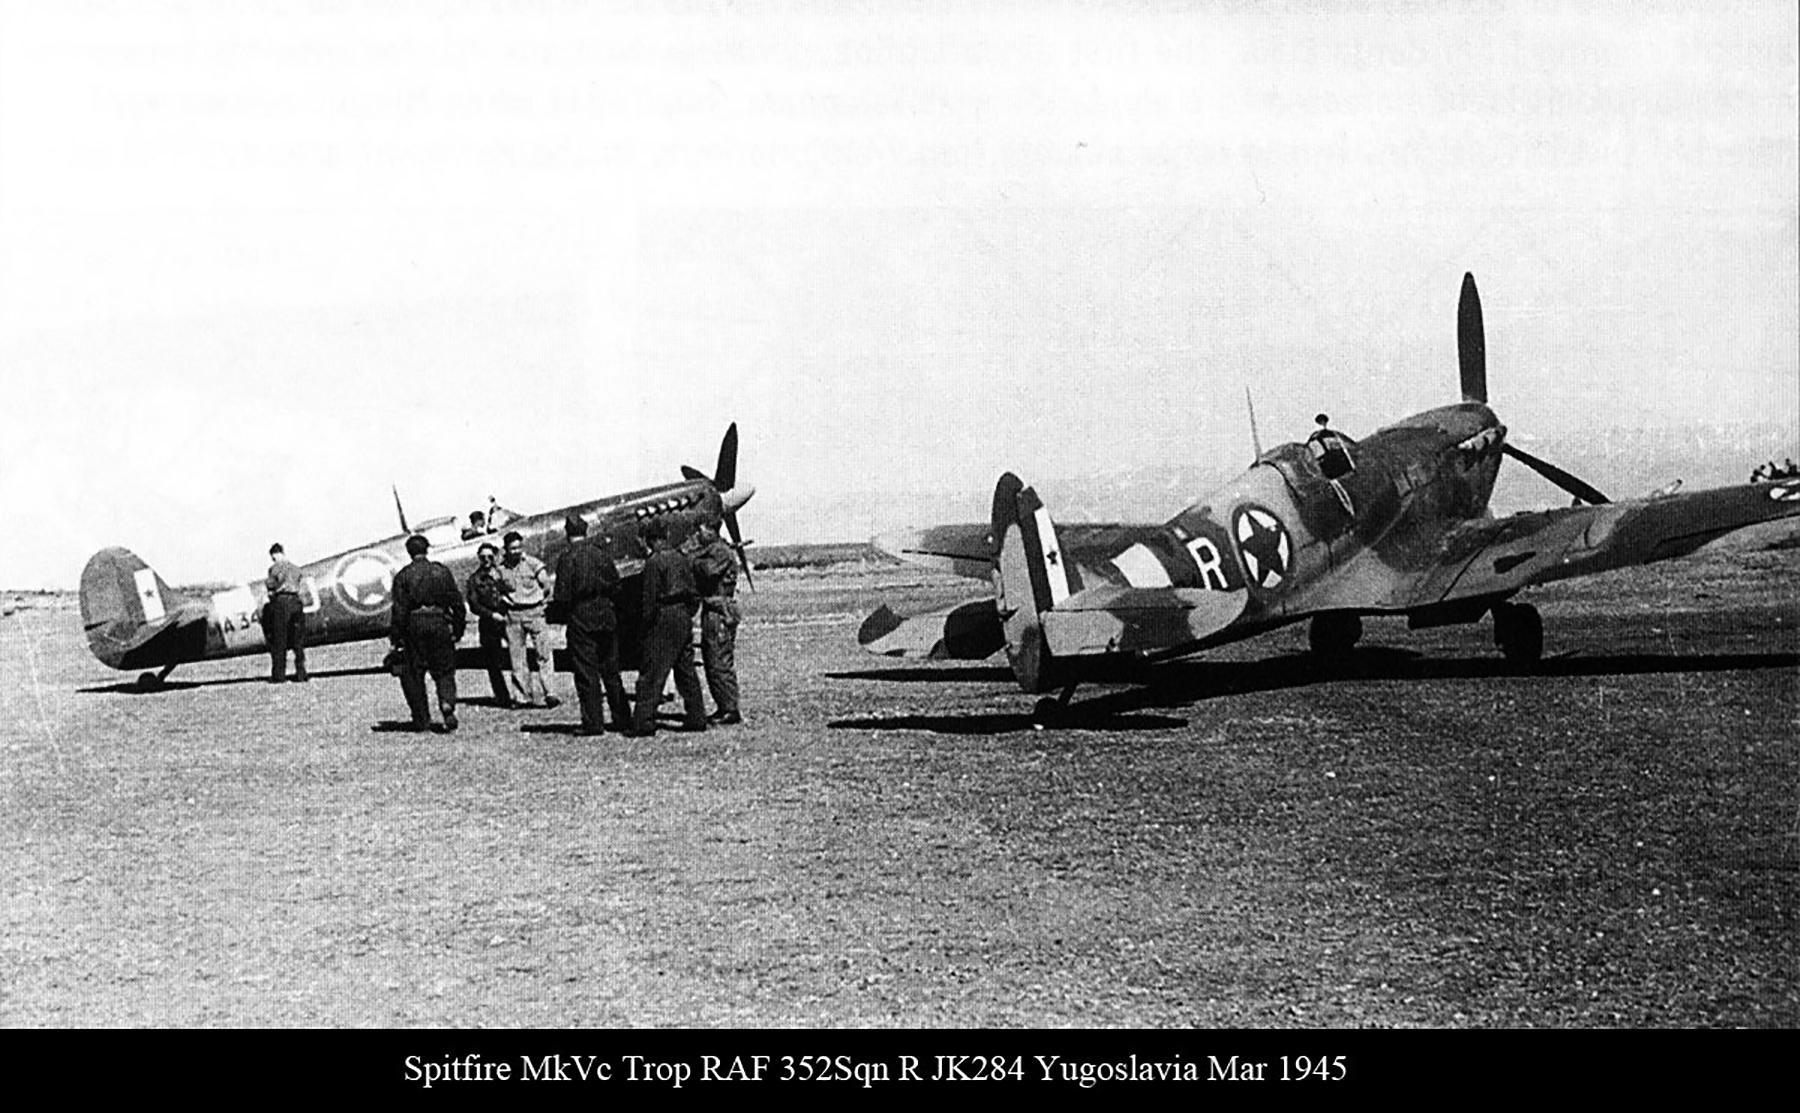 Spitfire MkVcTrop RAF 352Sqn R JK284 Yugoslavia Mar 1945 01